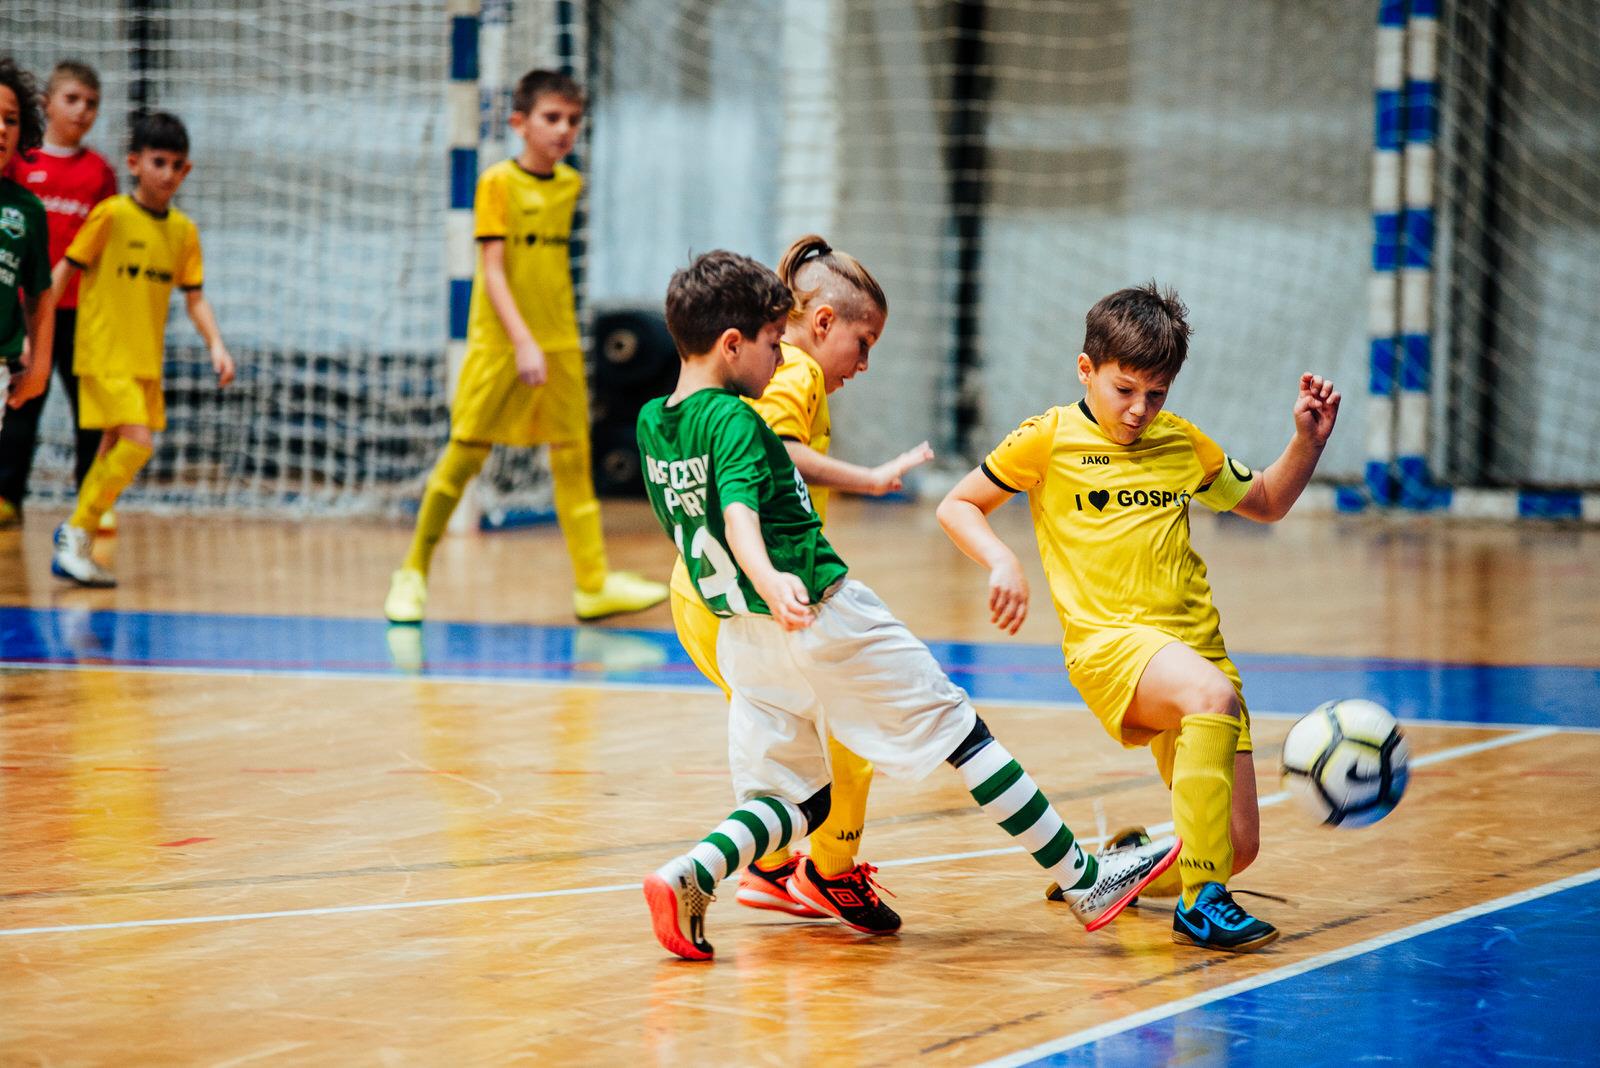 likaclub_zimska-malonogometna-liga-gospić_2019-20-43